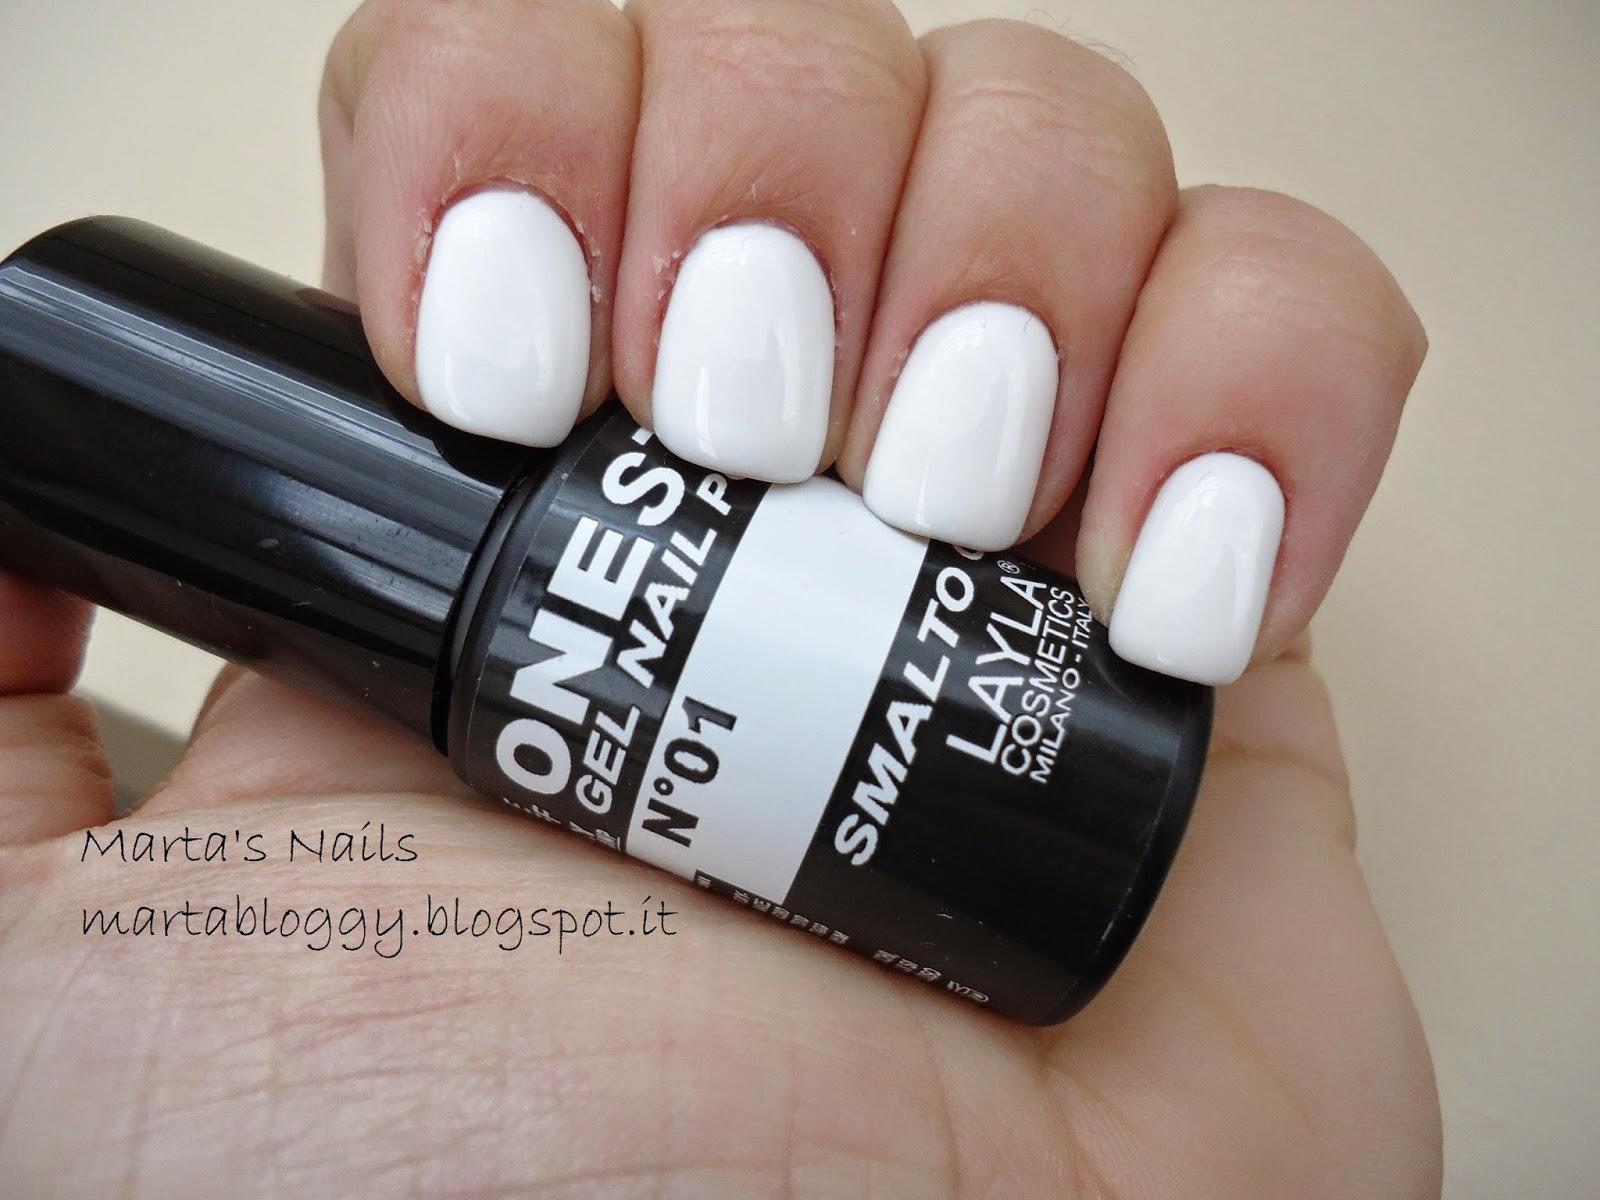 Favorito Marta's Nails: 78: Smalto Gel One Step Layla n°01 Bianco JY18